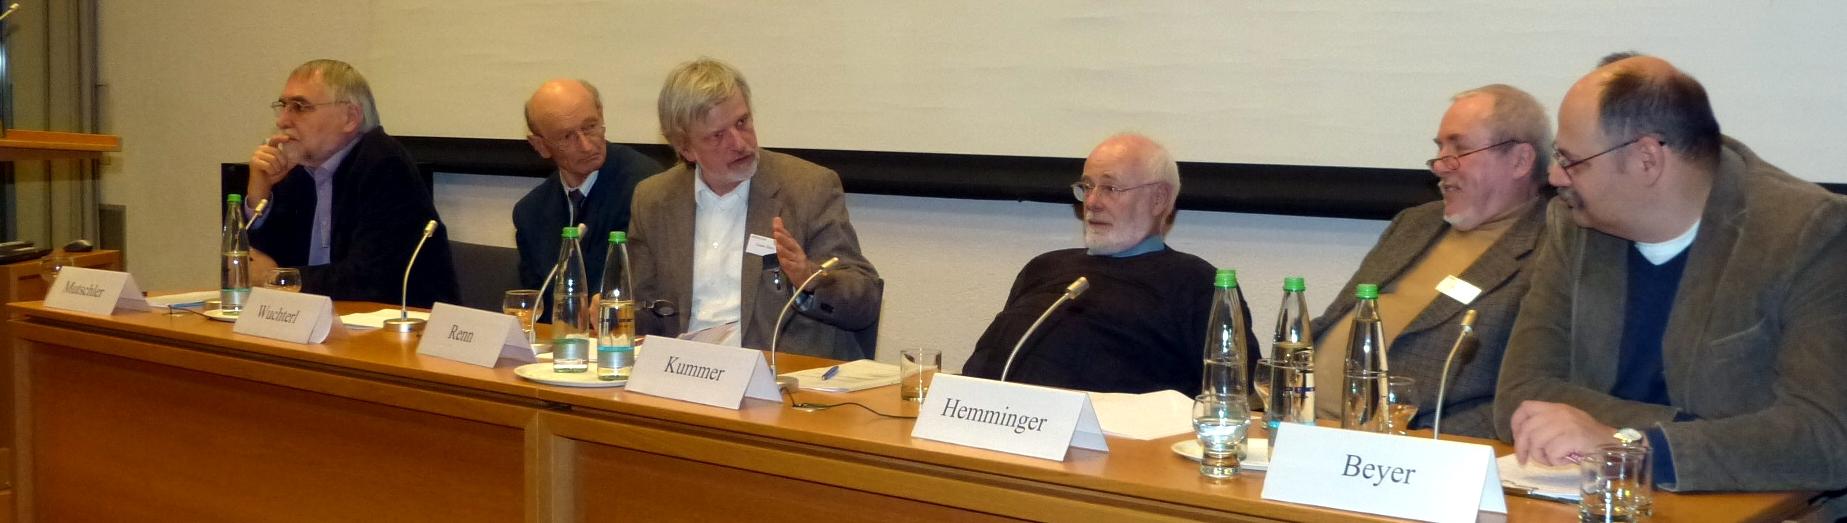 Gibt es Ziele in der Natur? Pro- und Antagonisten Prof. Dr. Hans-Dieter Mutschler, Prof. Dr. Kurt Wuchterl, Prof. Dr. Ortwin Renn (Moderation), Prof. Dr. Christian Kummer SJ, Dr. habil. Hansjörg Hemminger, Prof. Dr. Andreas Beyer (v.l.n.r.)